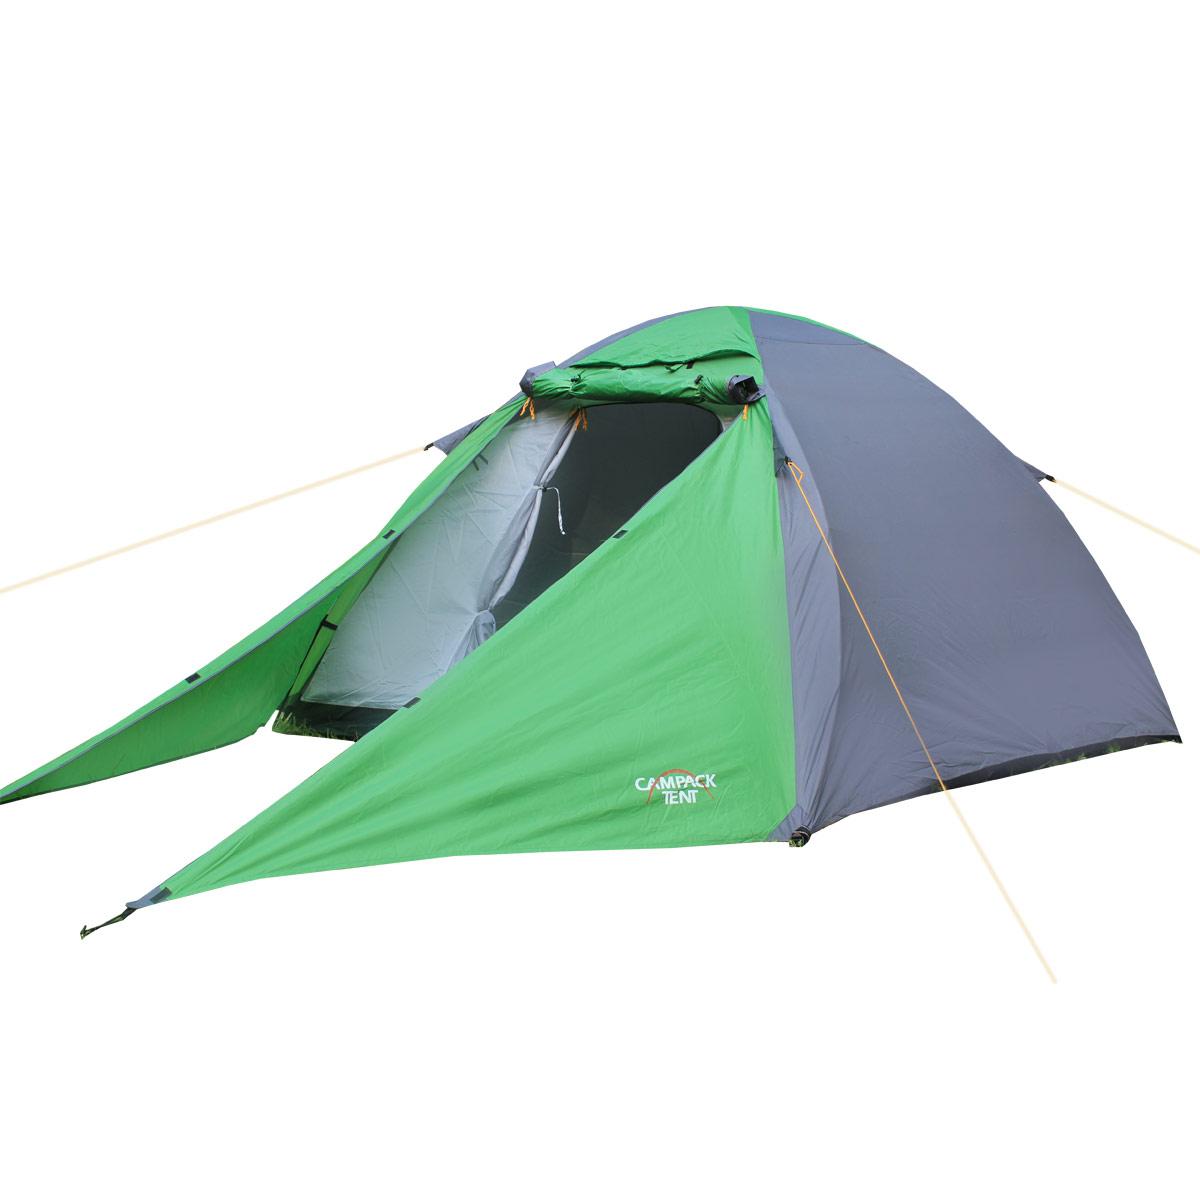 Палатка Campack Tent Forest Explorer 2, цвет: серо-зеленый